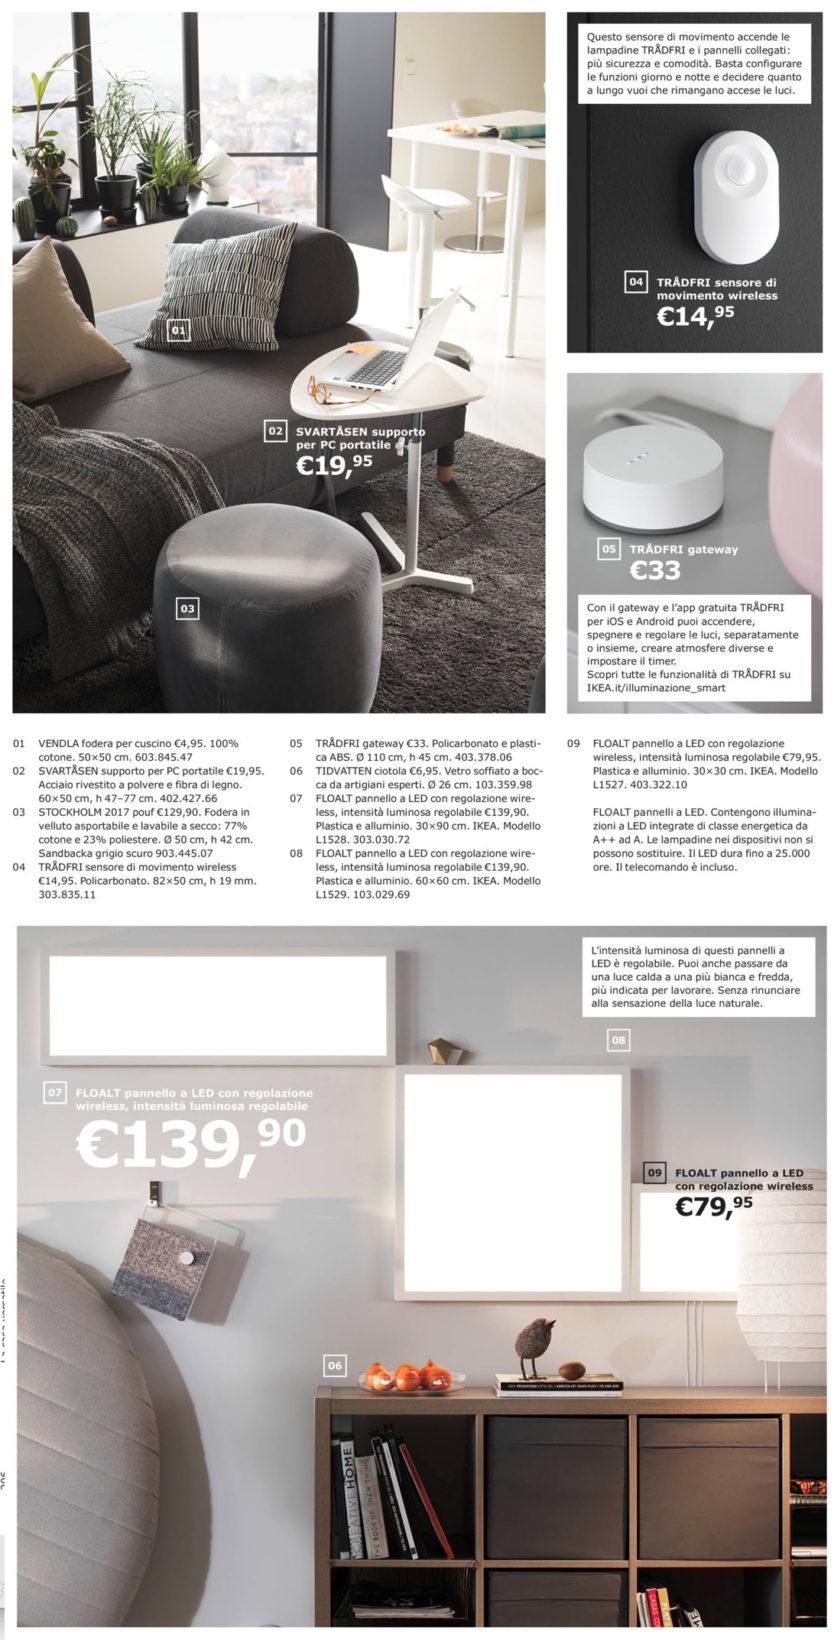 Catalogo ikea 2019 tra casa smart e speaker bluetooth - Ikea accessori casa ...